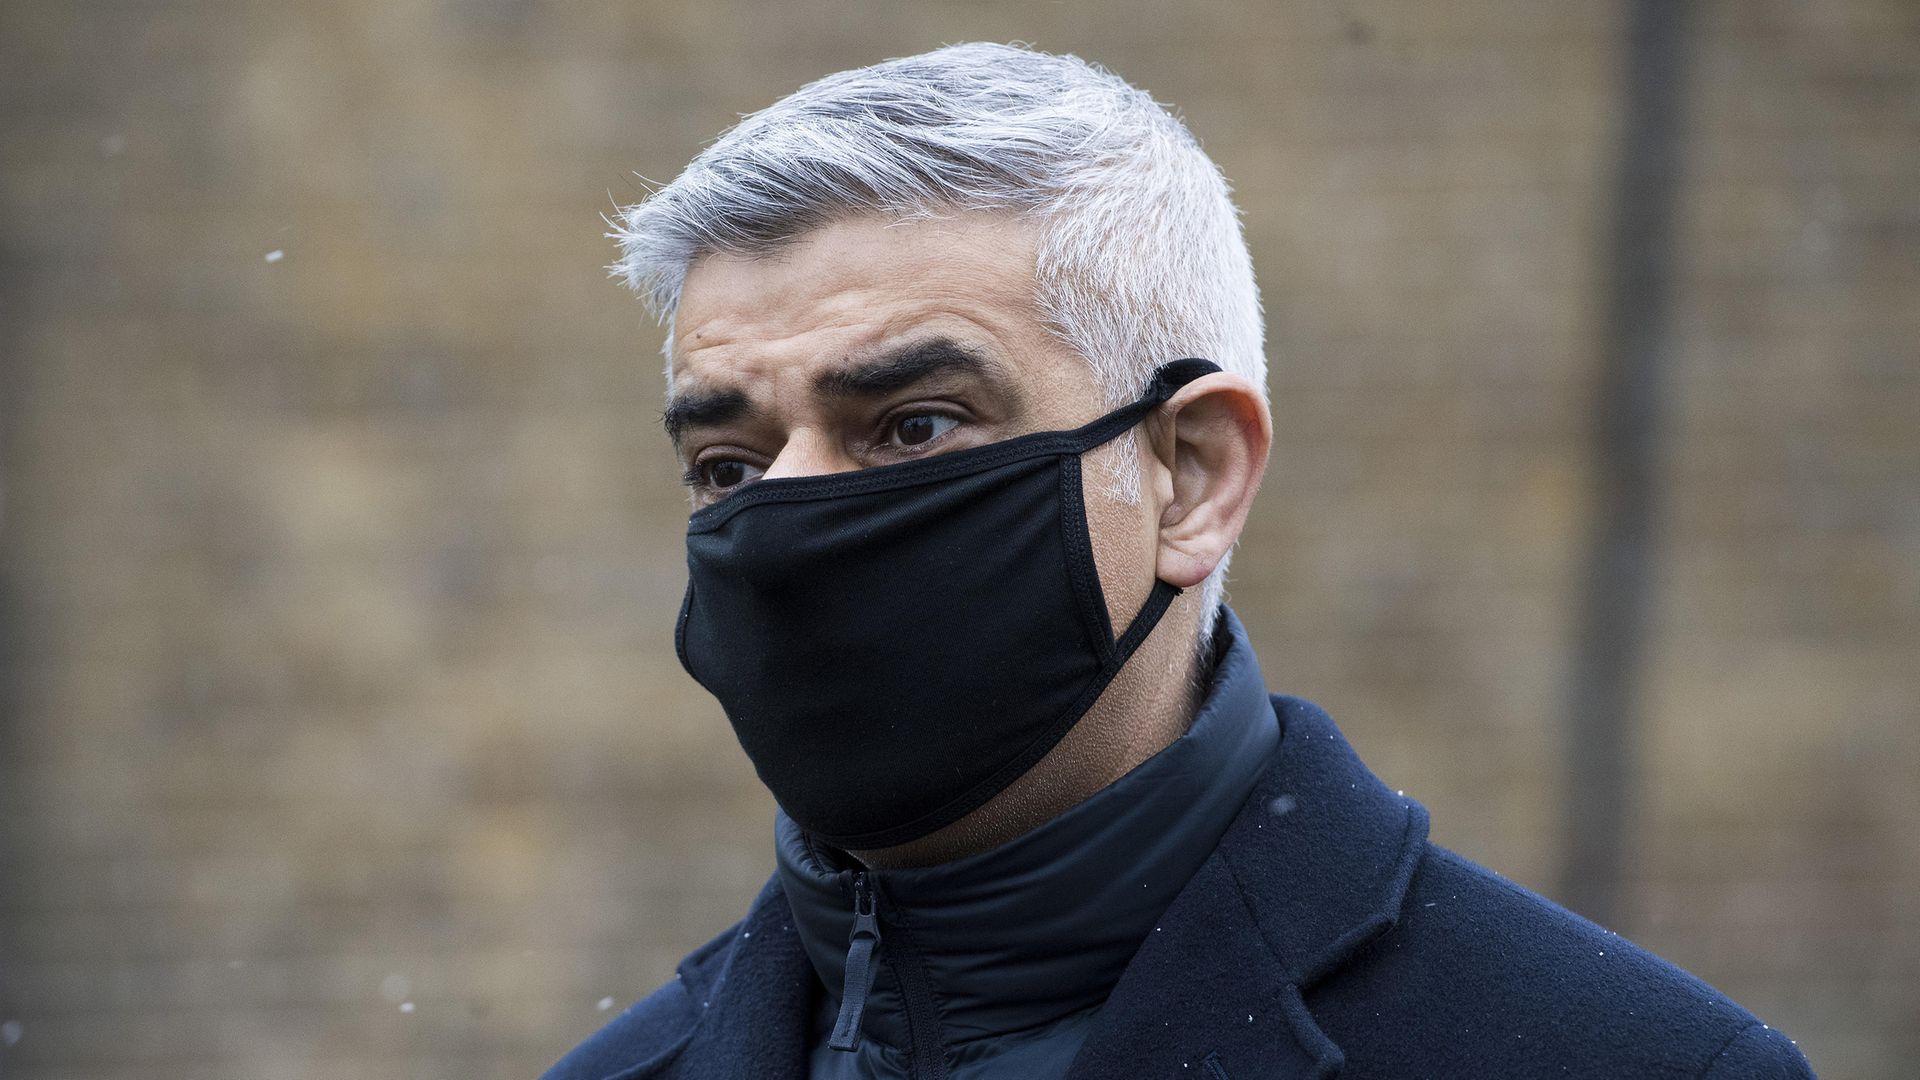 Mayor of London Sadiq Khan has hit back at Jacob Rees-Mogg for calling him 'Red Khan' - Credit: PA